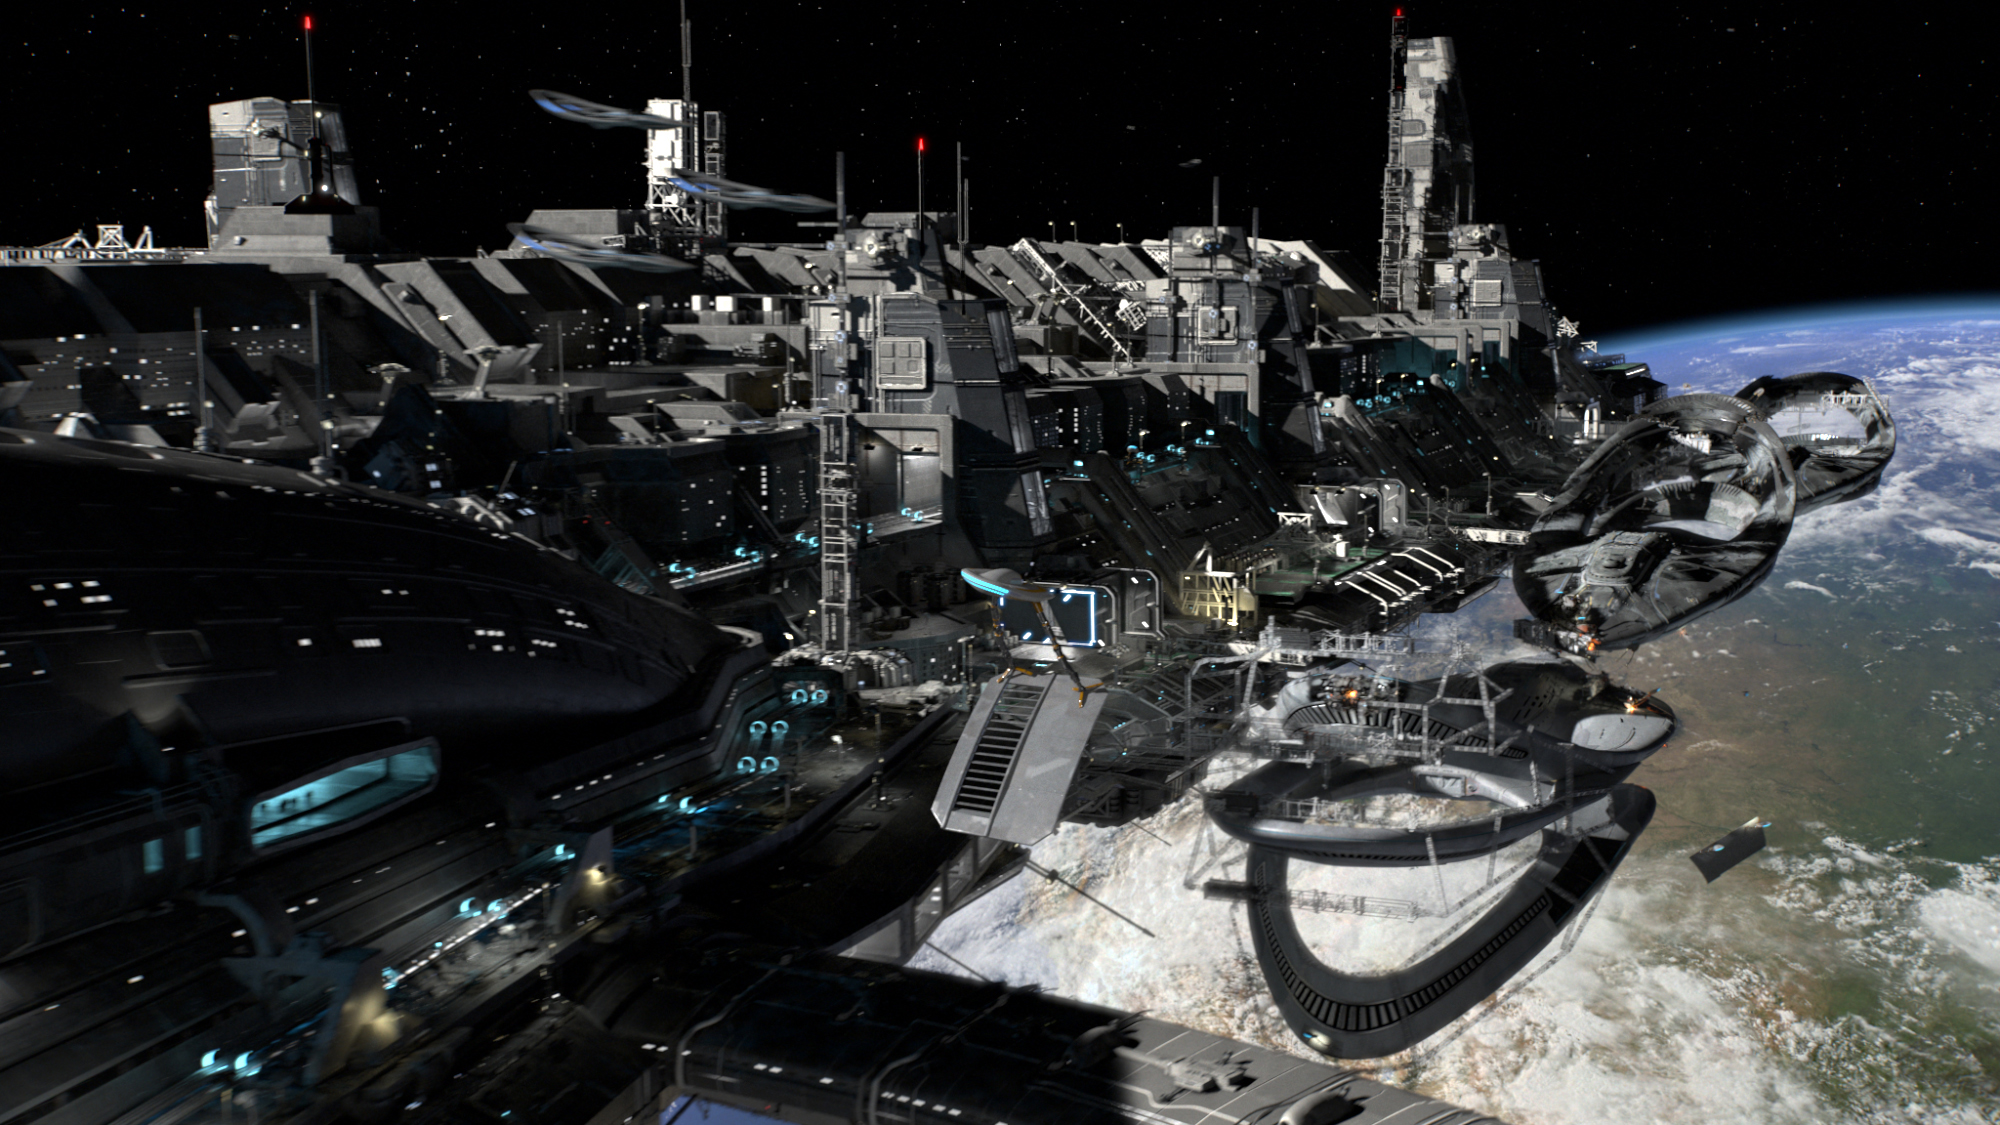 The Orville - Battleship